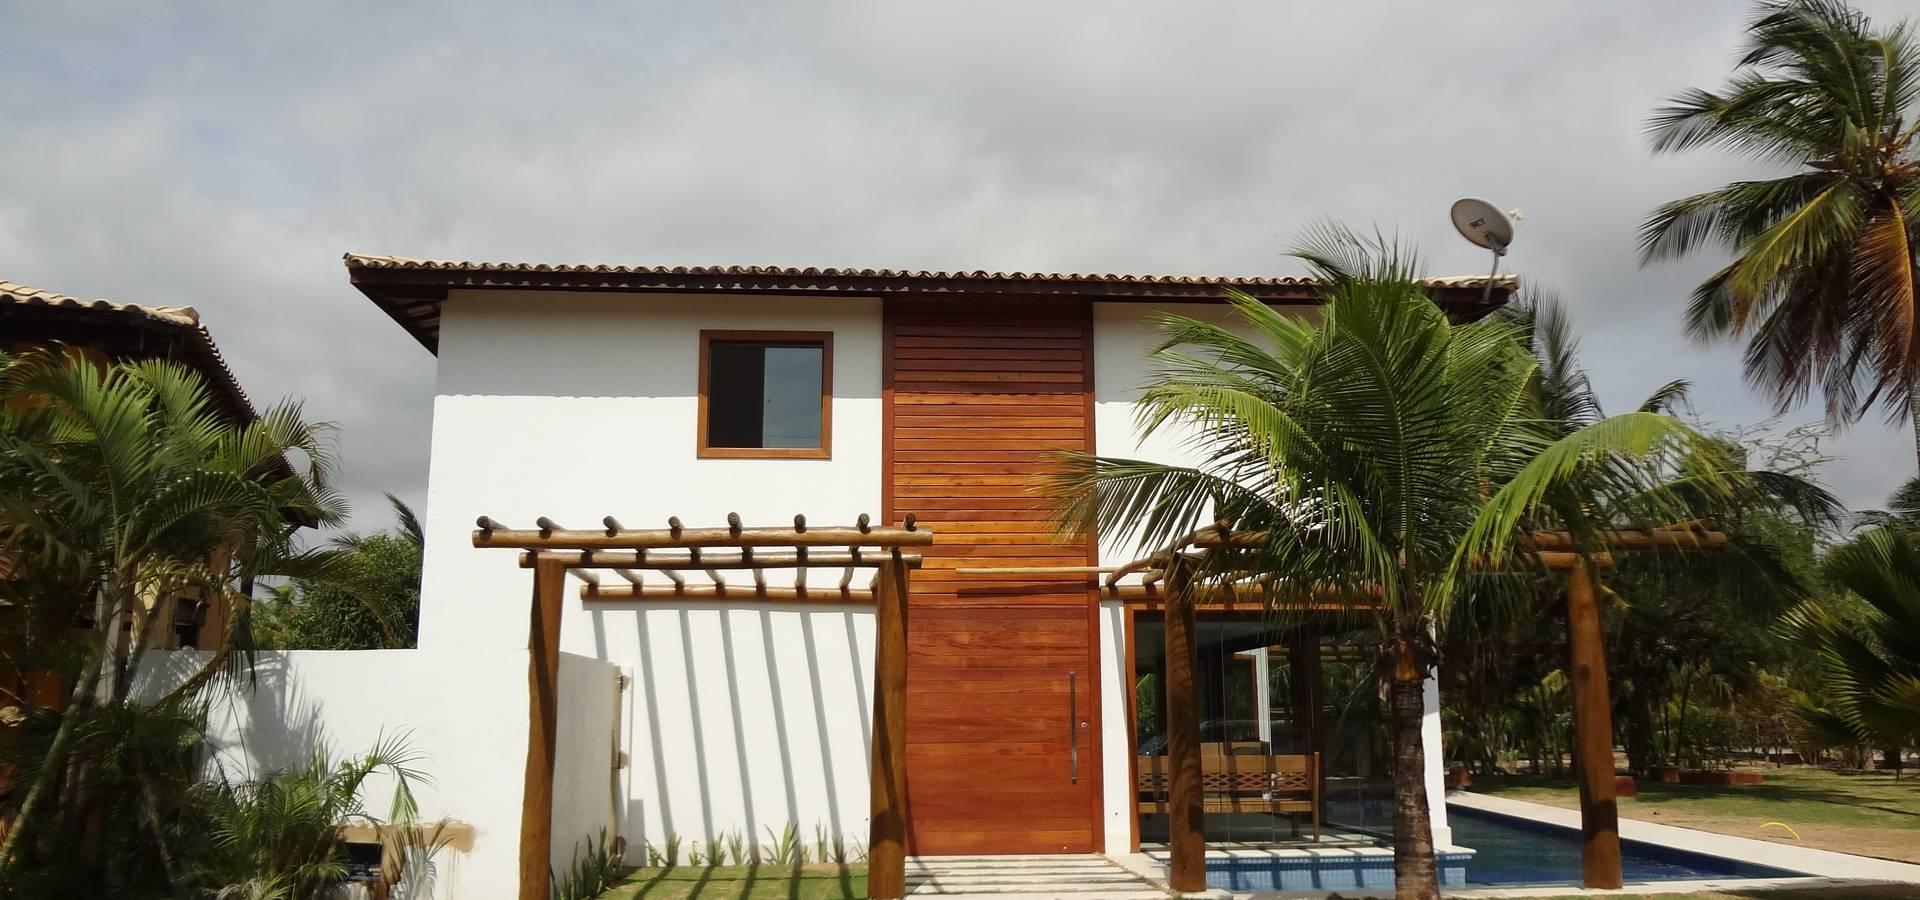 Tupinanquim Arquitetura Brasilis